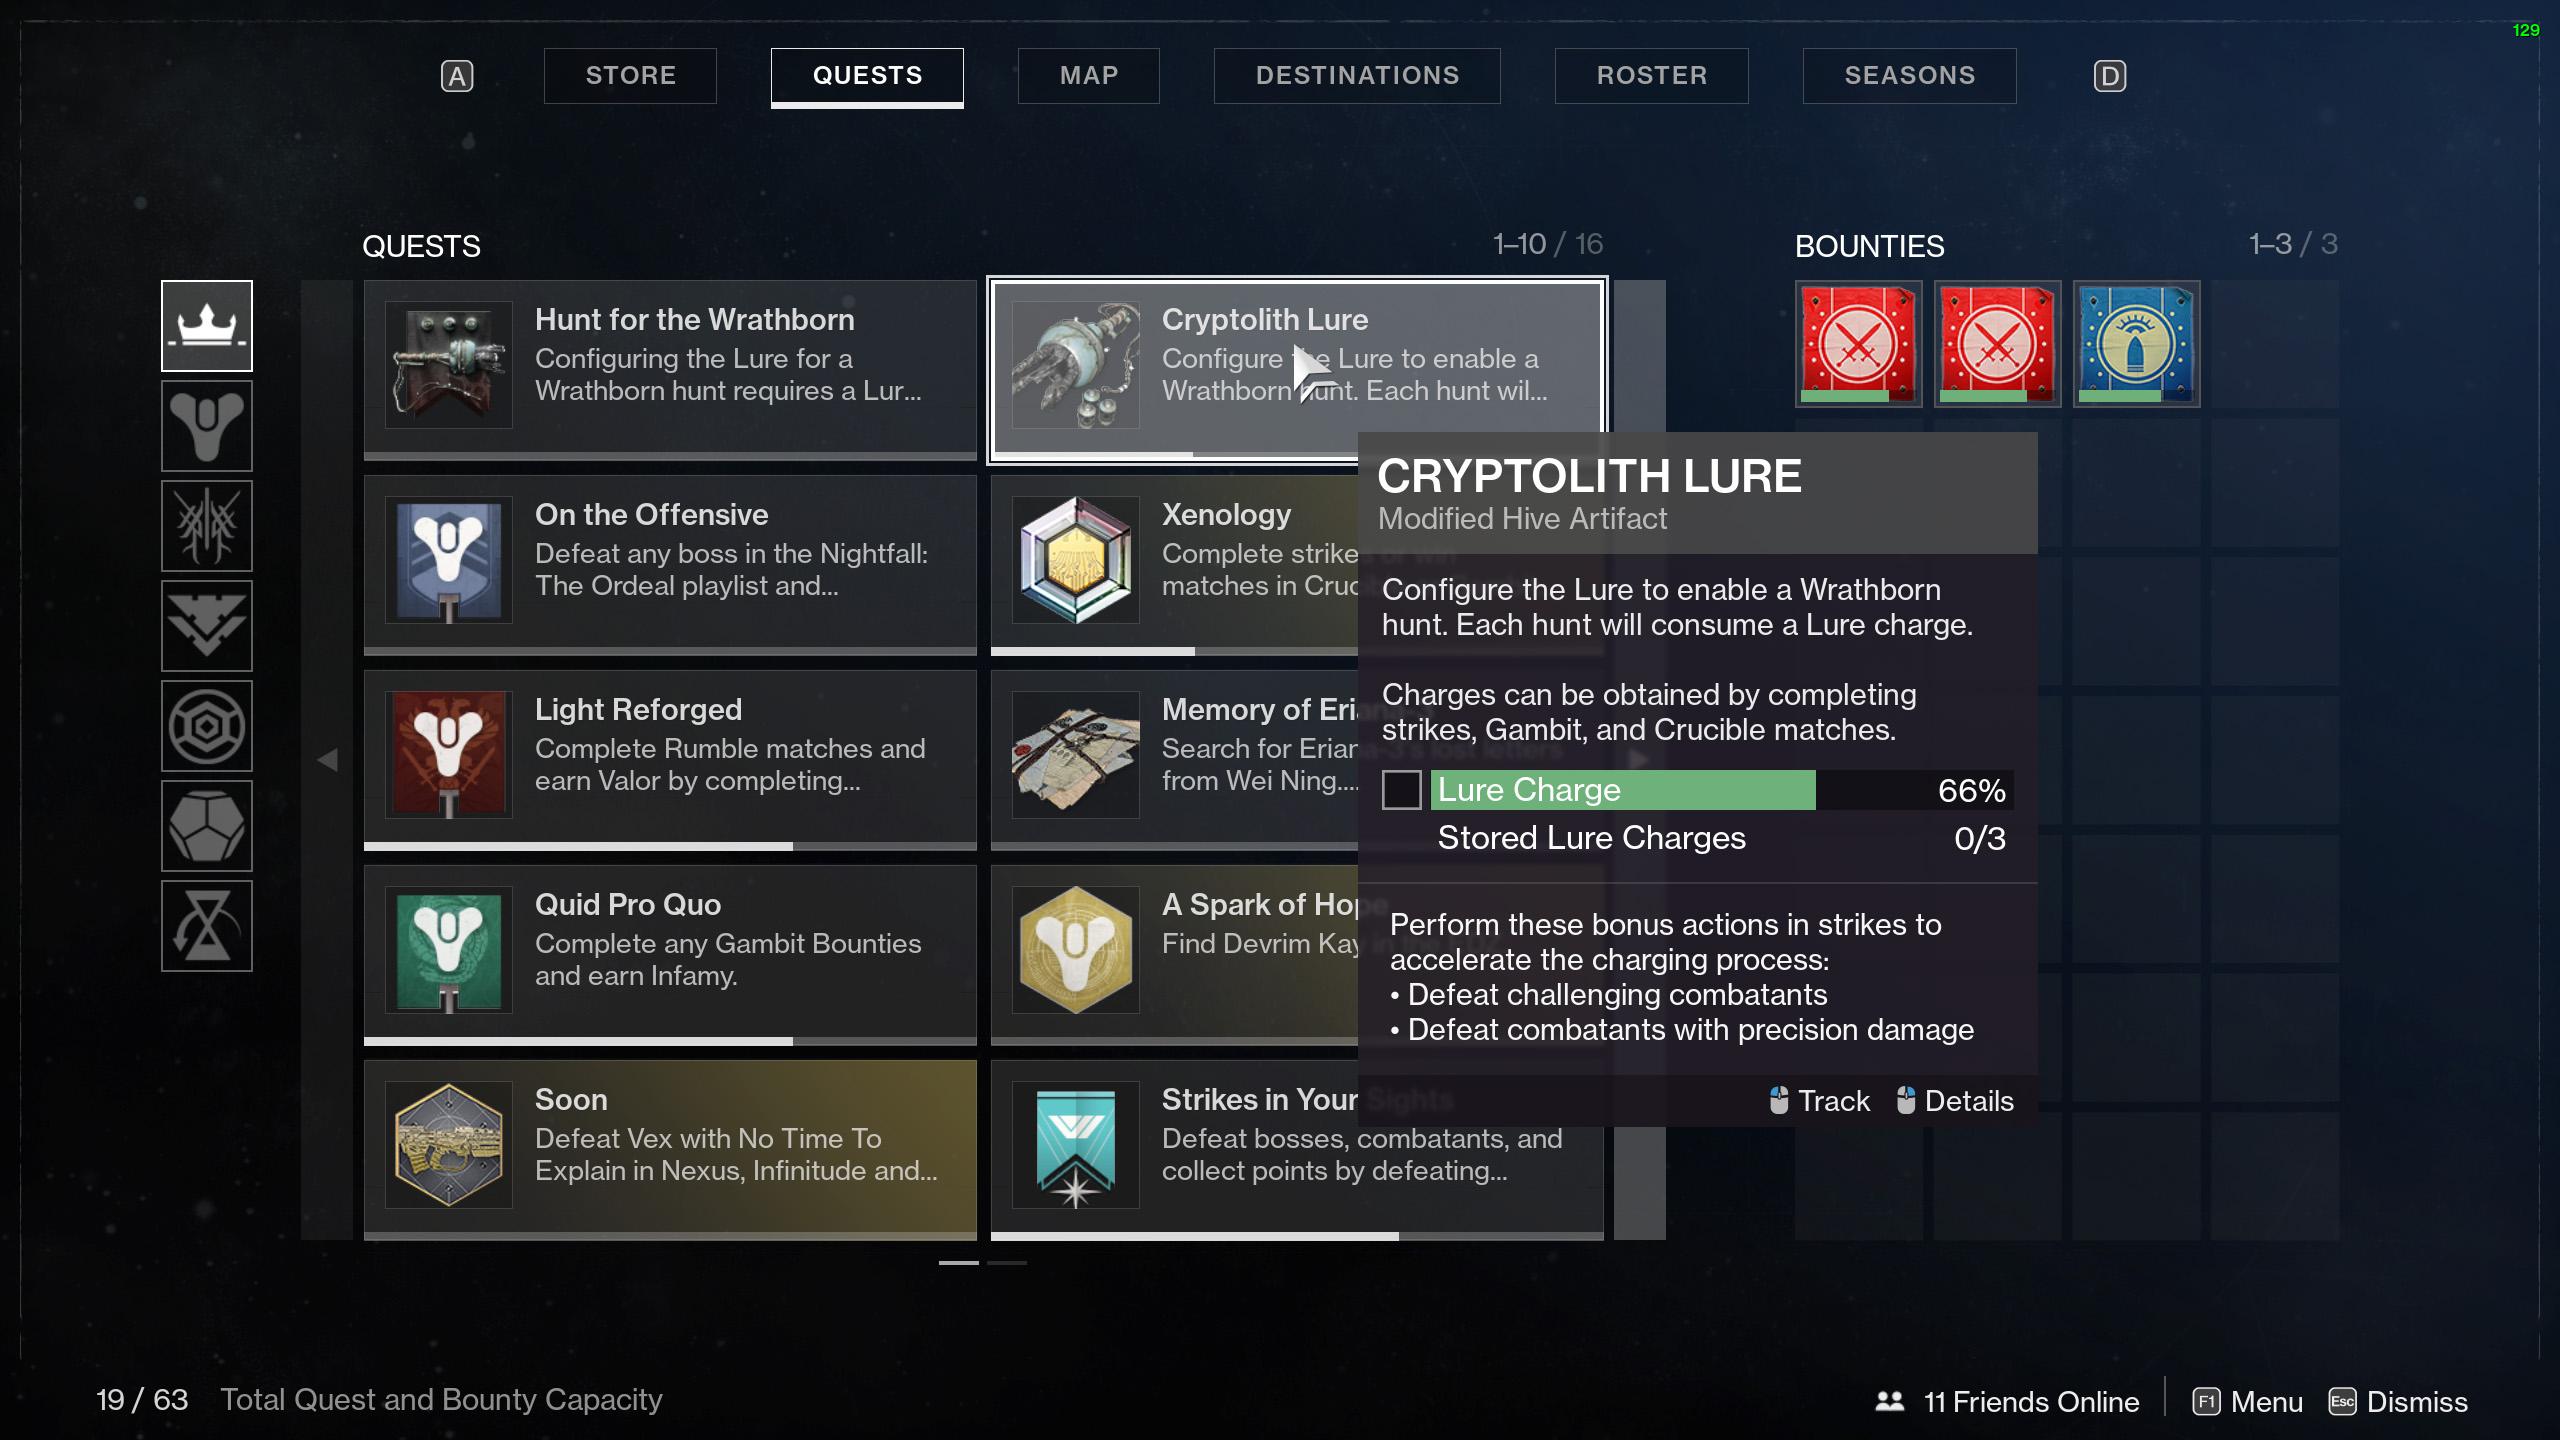 destiny 2 configure lure